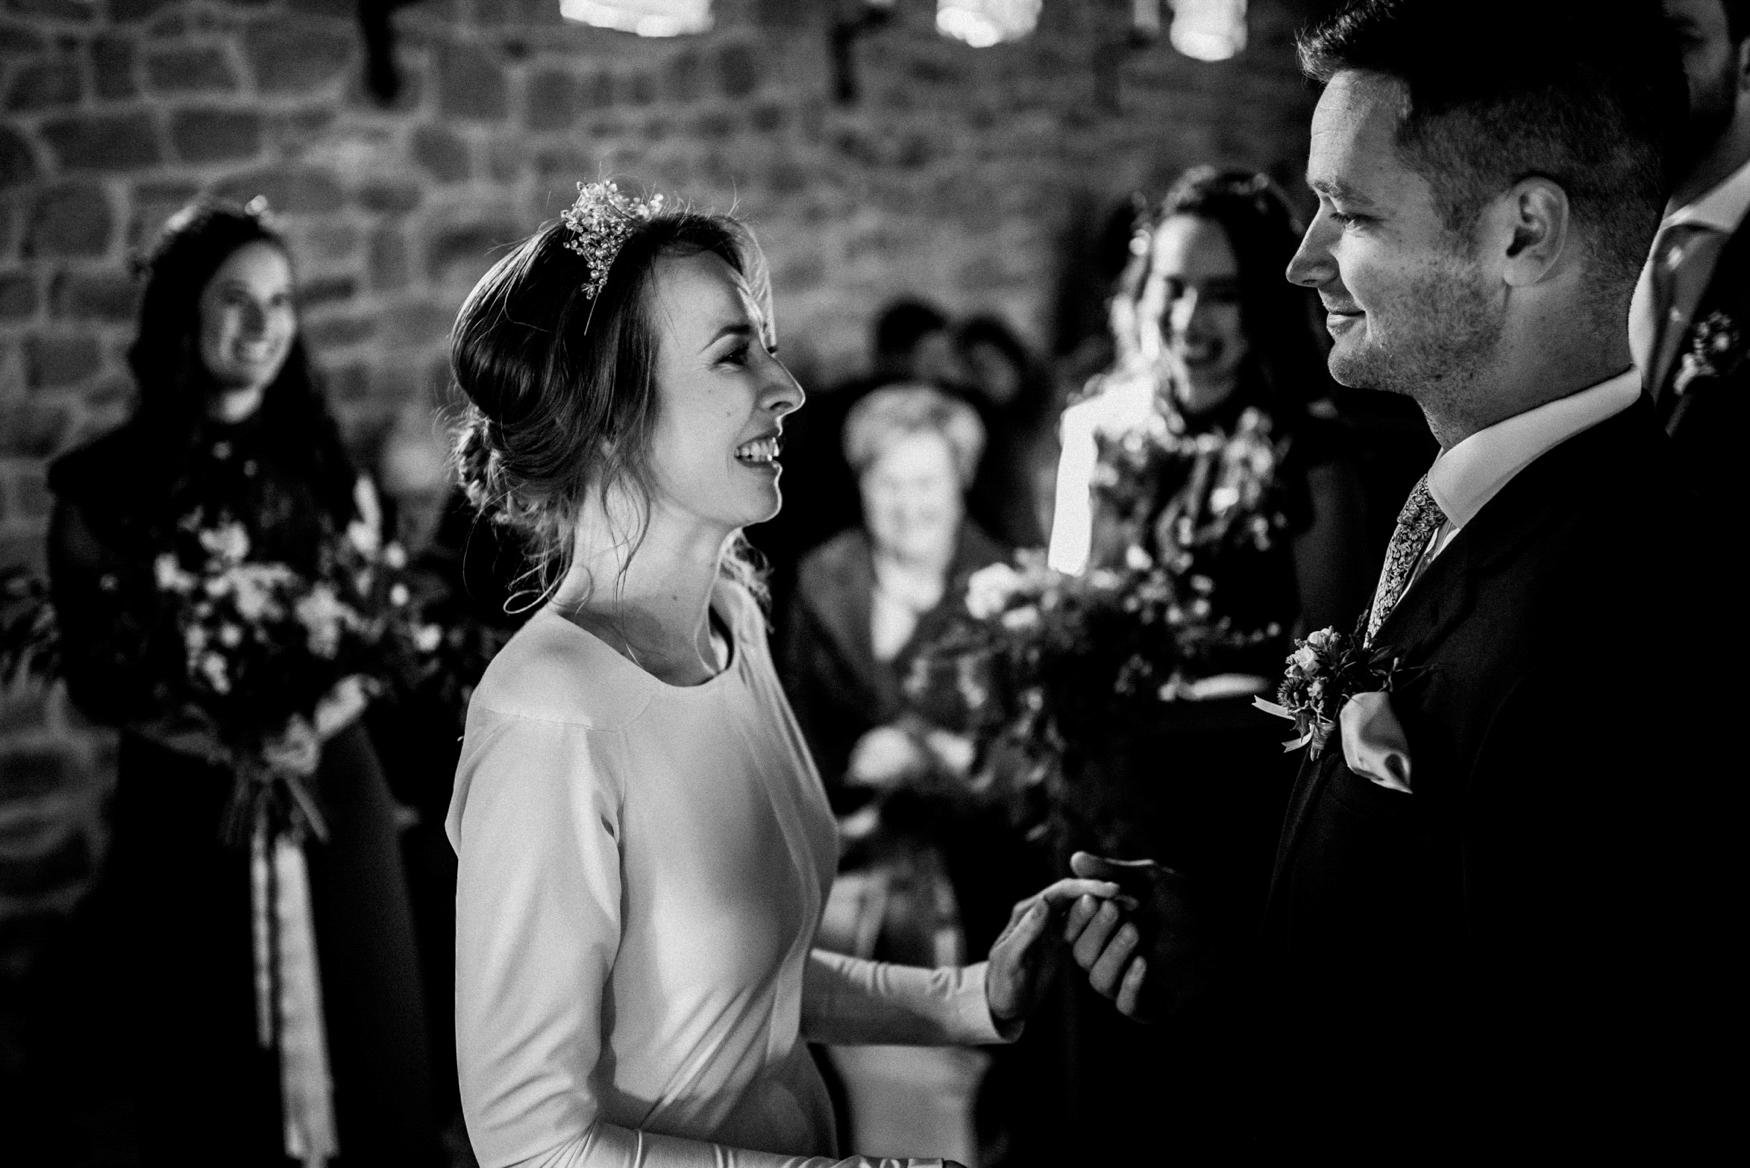 2 prague wedding photographer - boho svatba zikmundov021.jpg